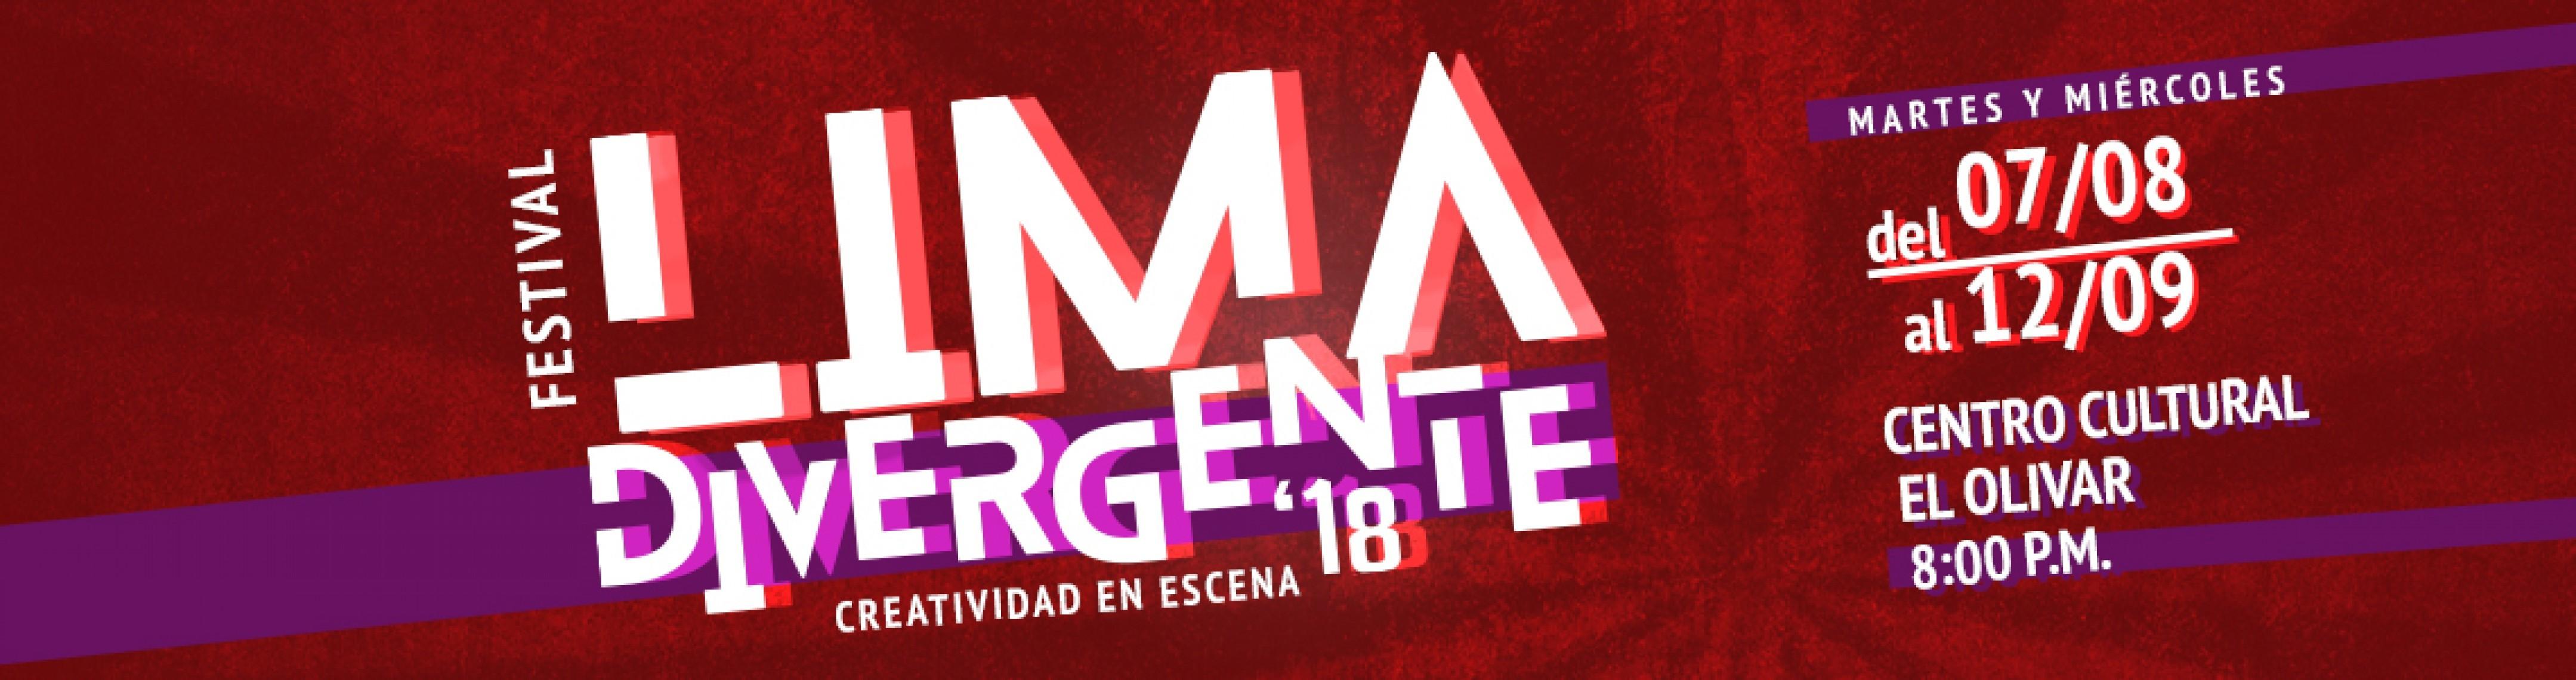 Festival Lima Divergente 2018